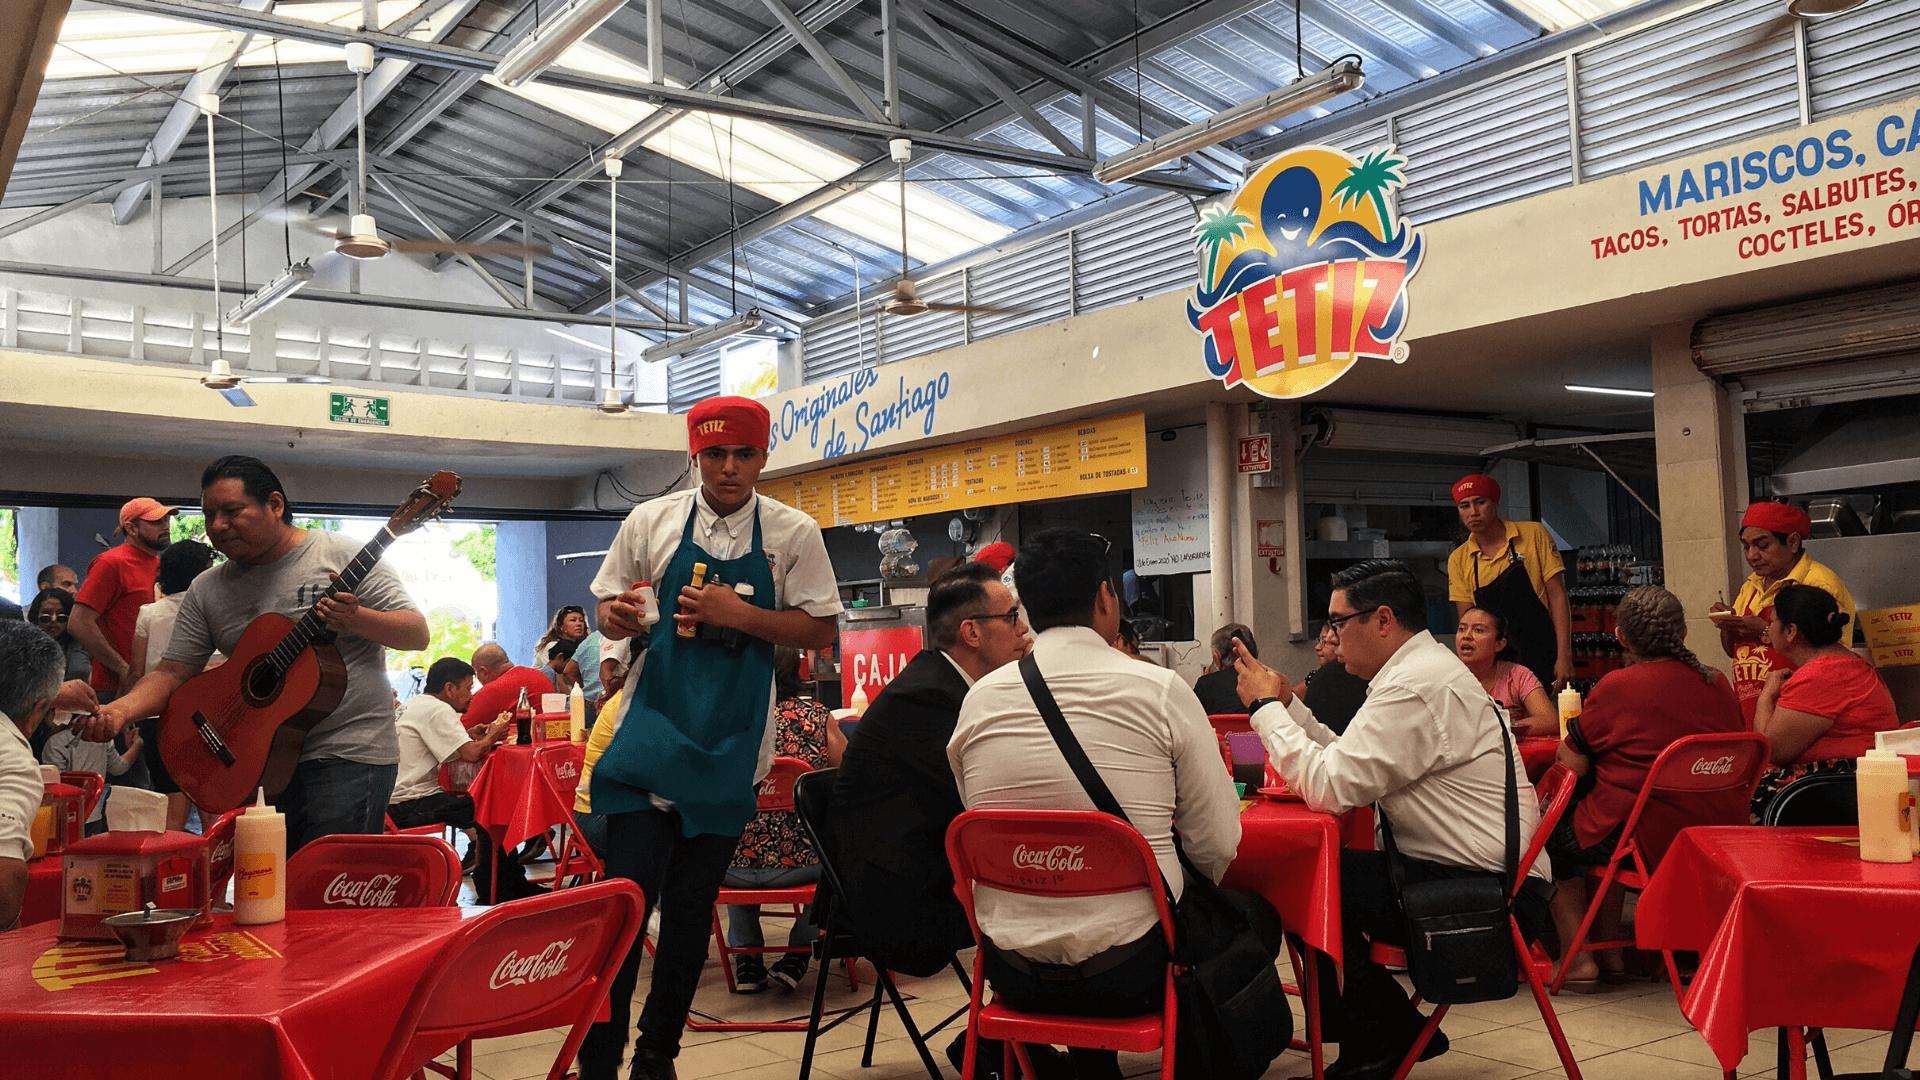 tetiz mariscos restaurant in santiago park merida mexico